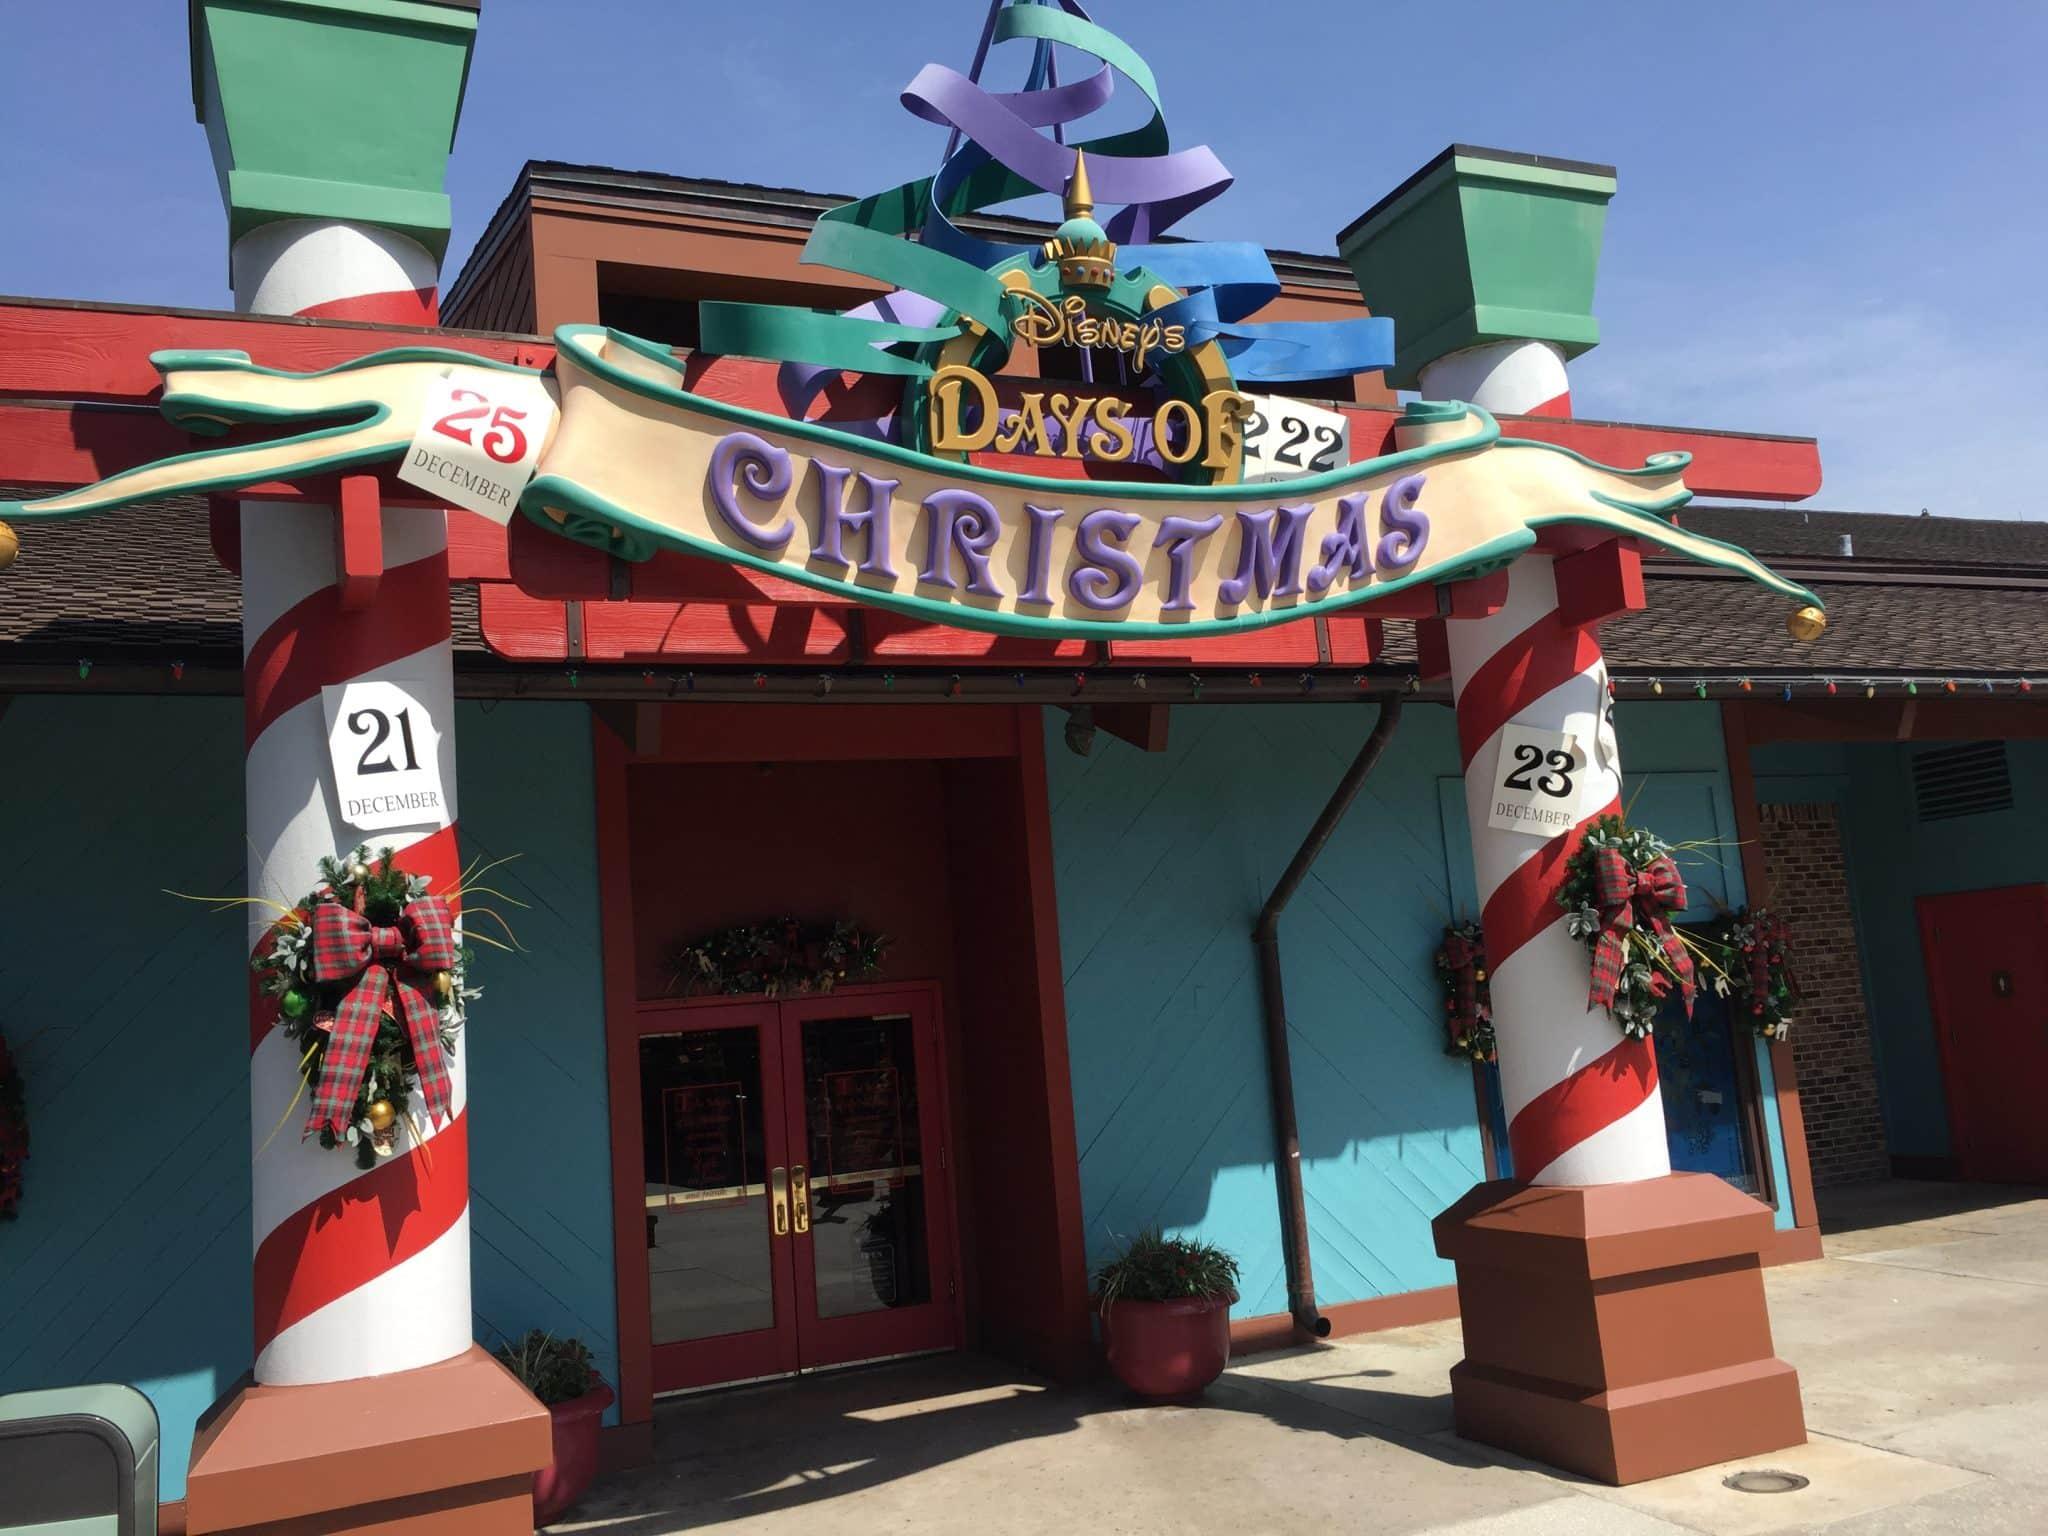 Loja Disney's Days of Christmas na Disney Springs